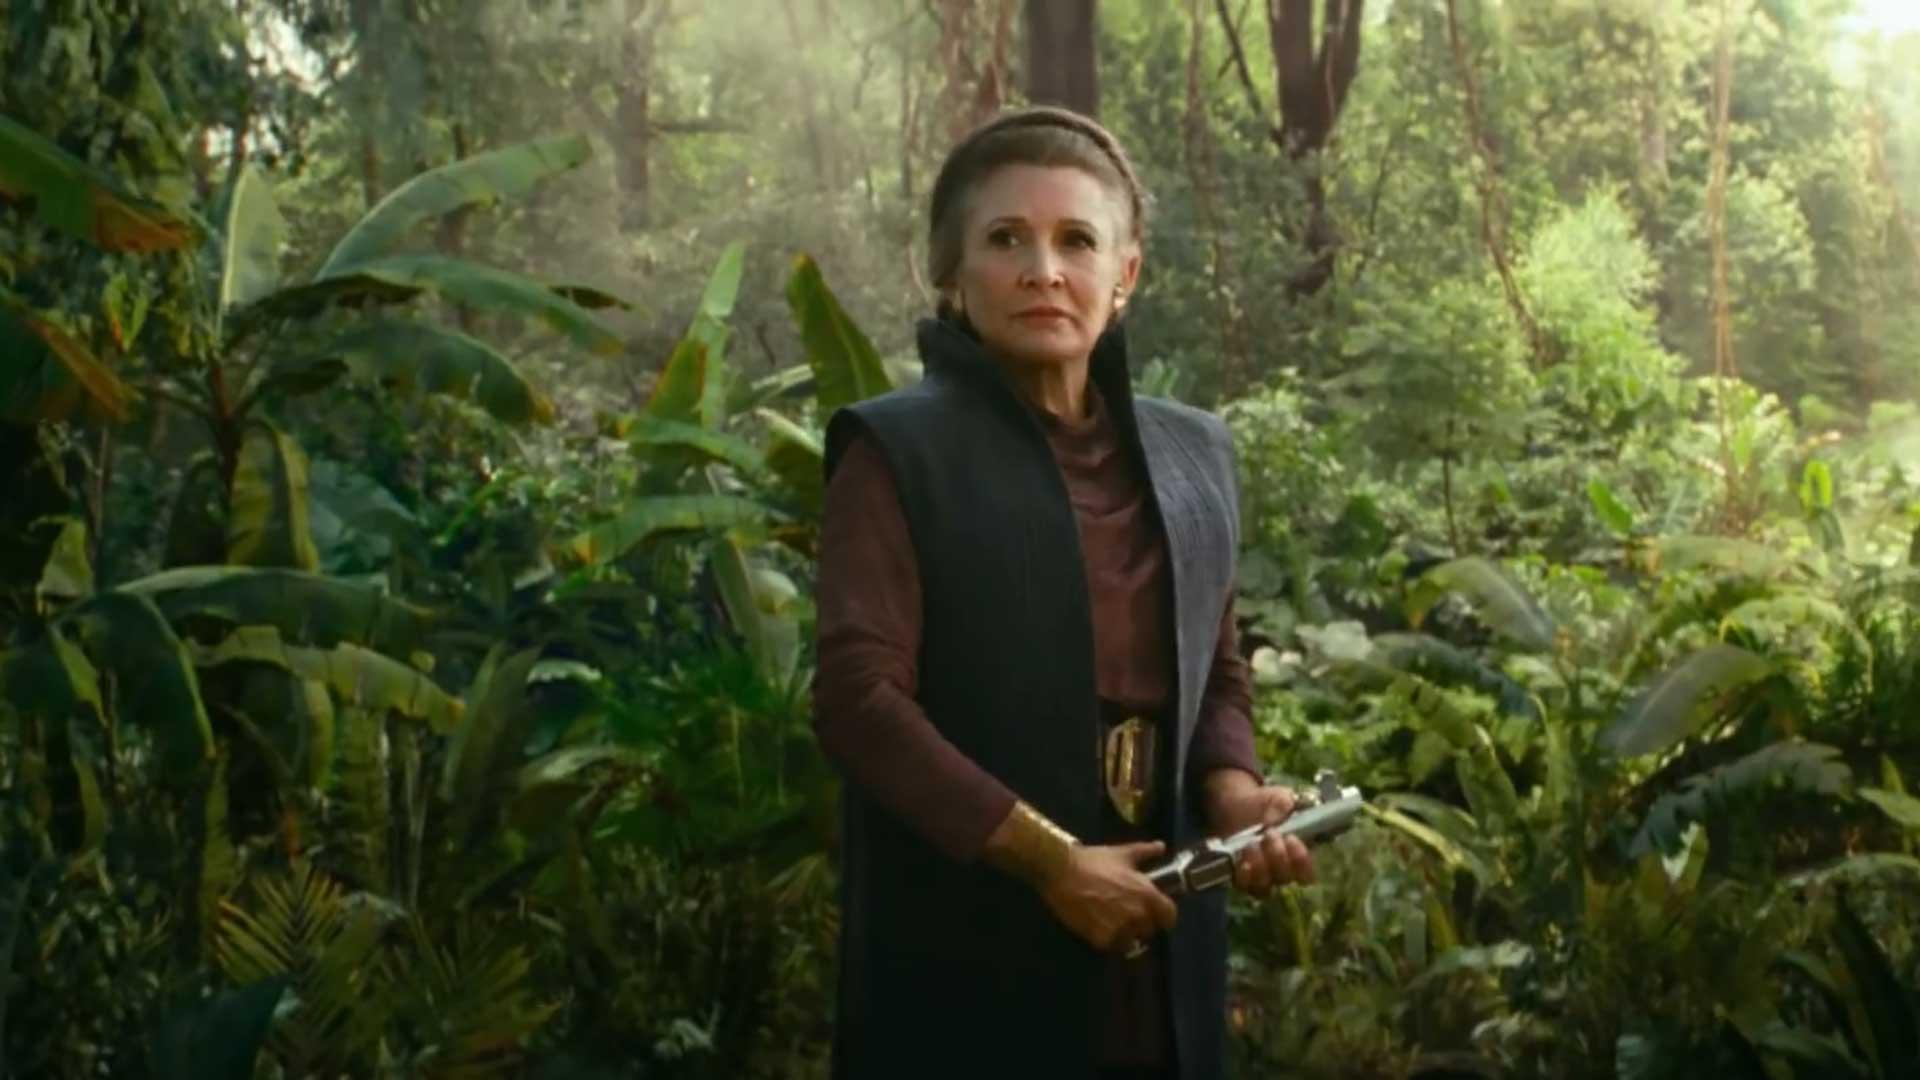 Carrie Fisher Appears In New Star Wars The Rise Of Skywalker Tv Spot Appocalypse